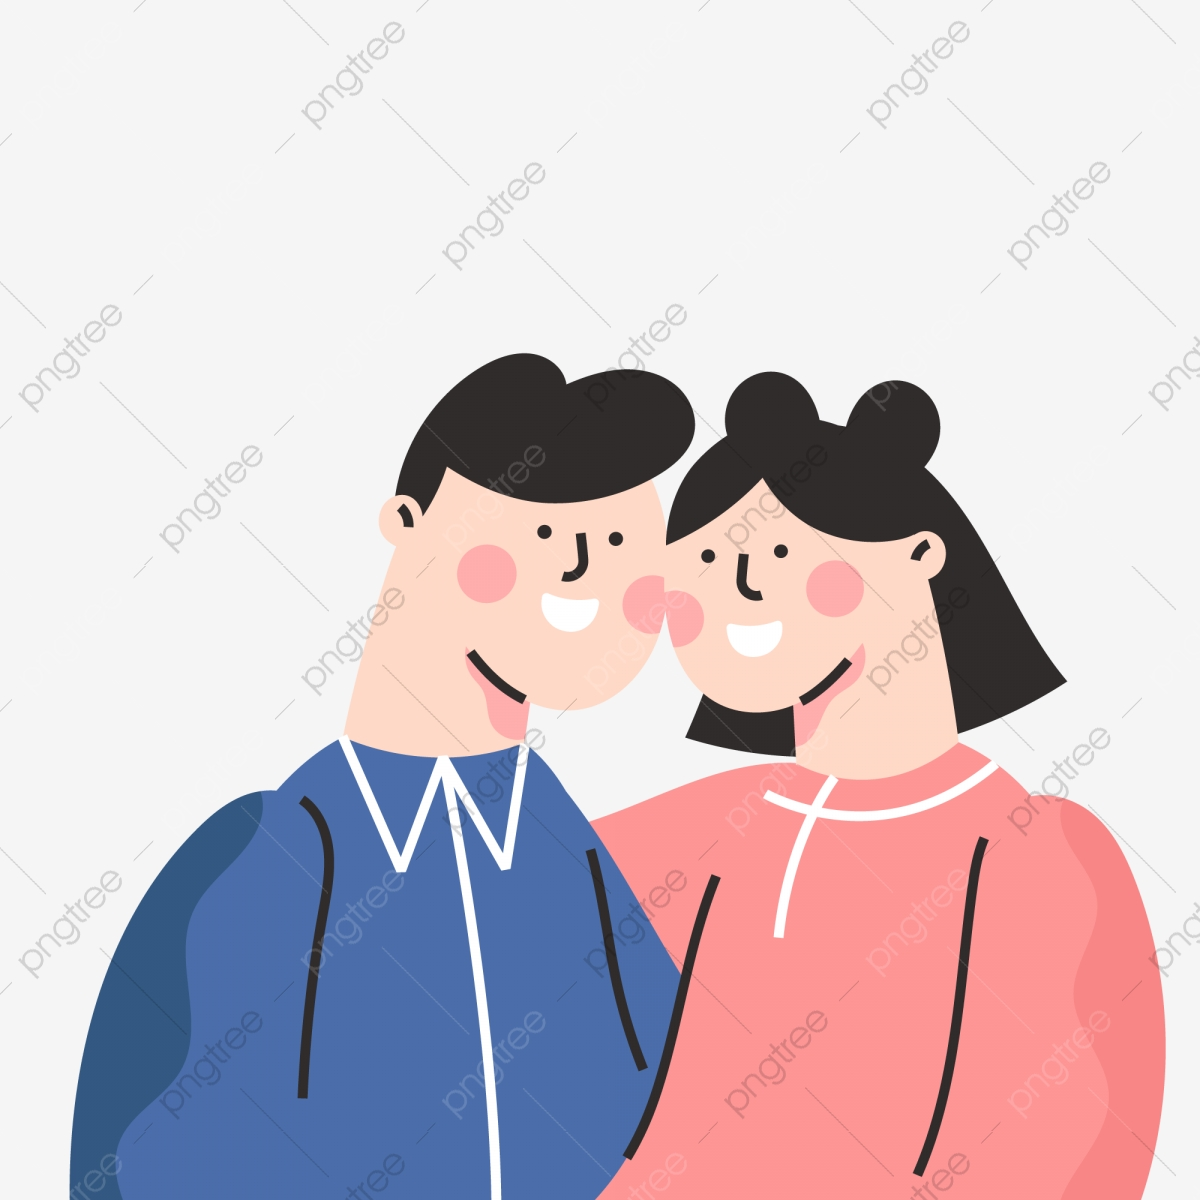 80+ Gambar Pasangan Romantis Kartun Islami Gratis